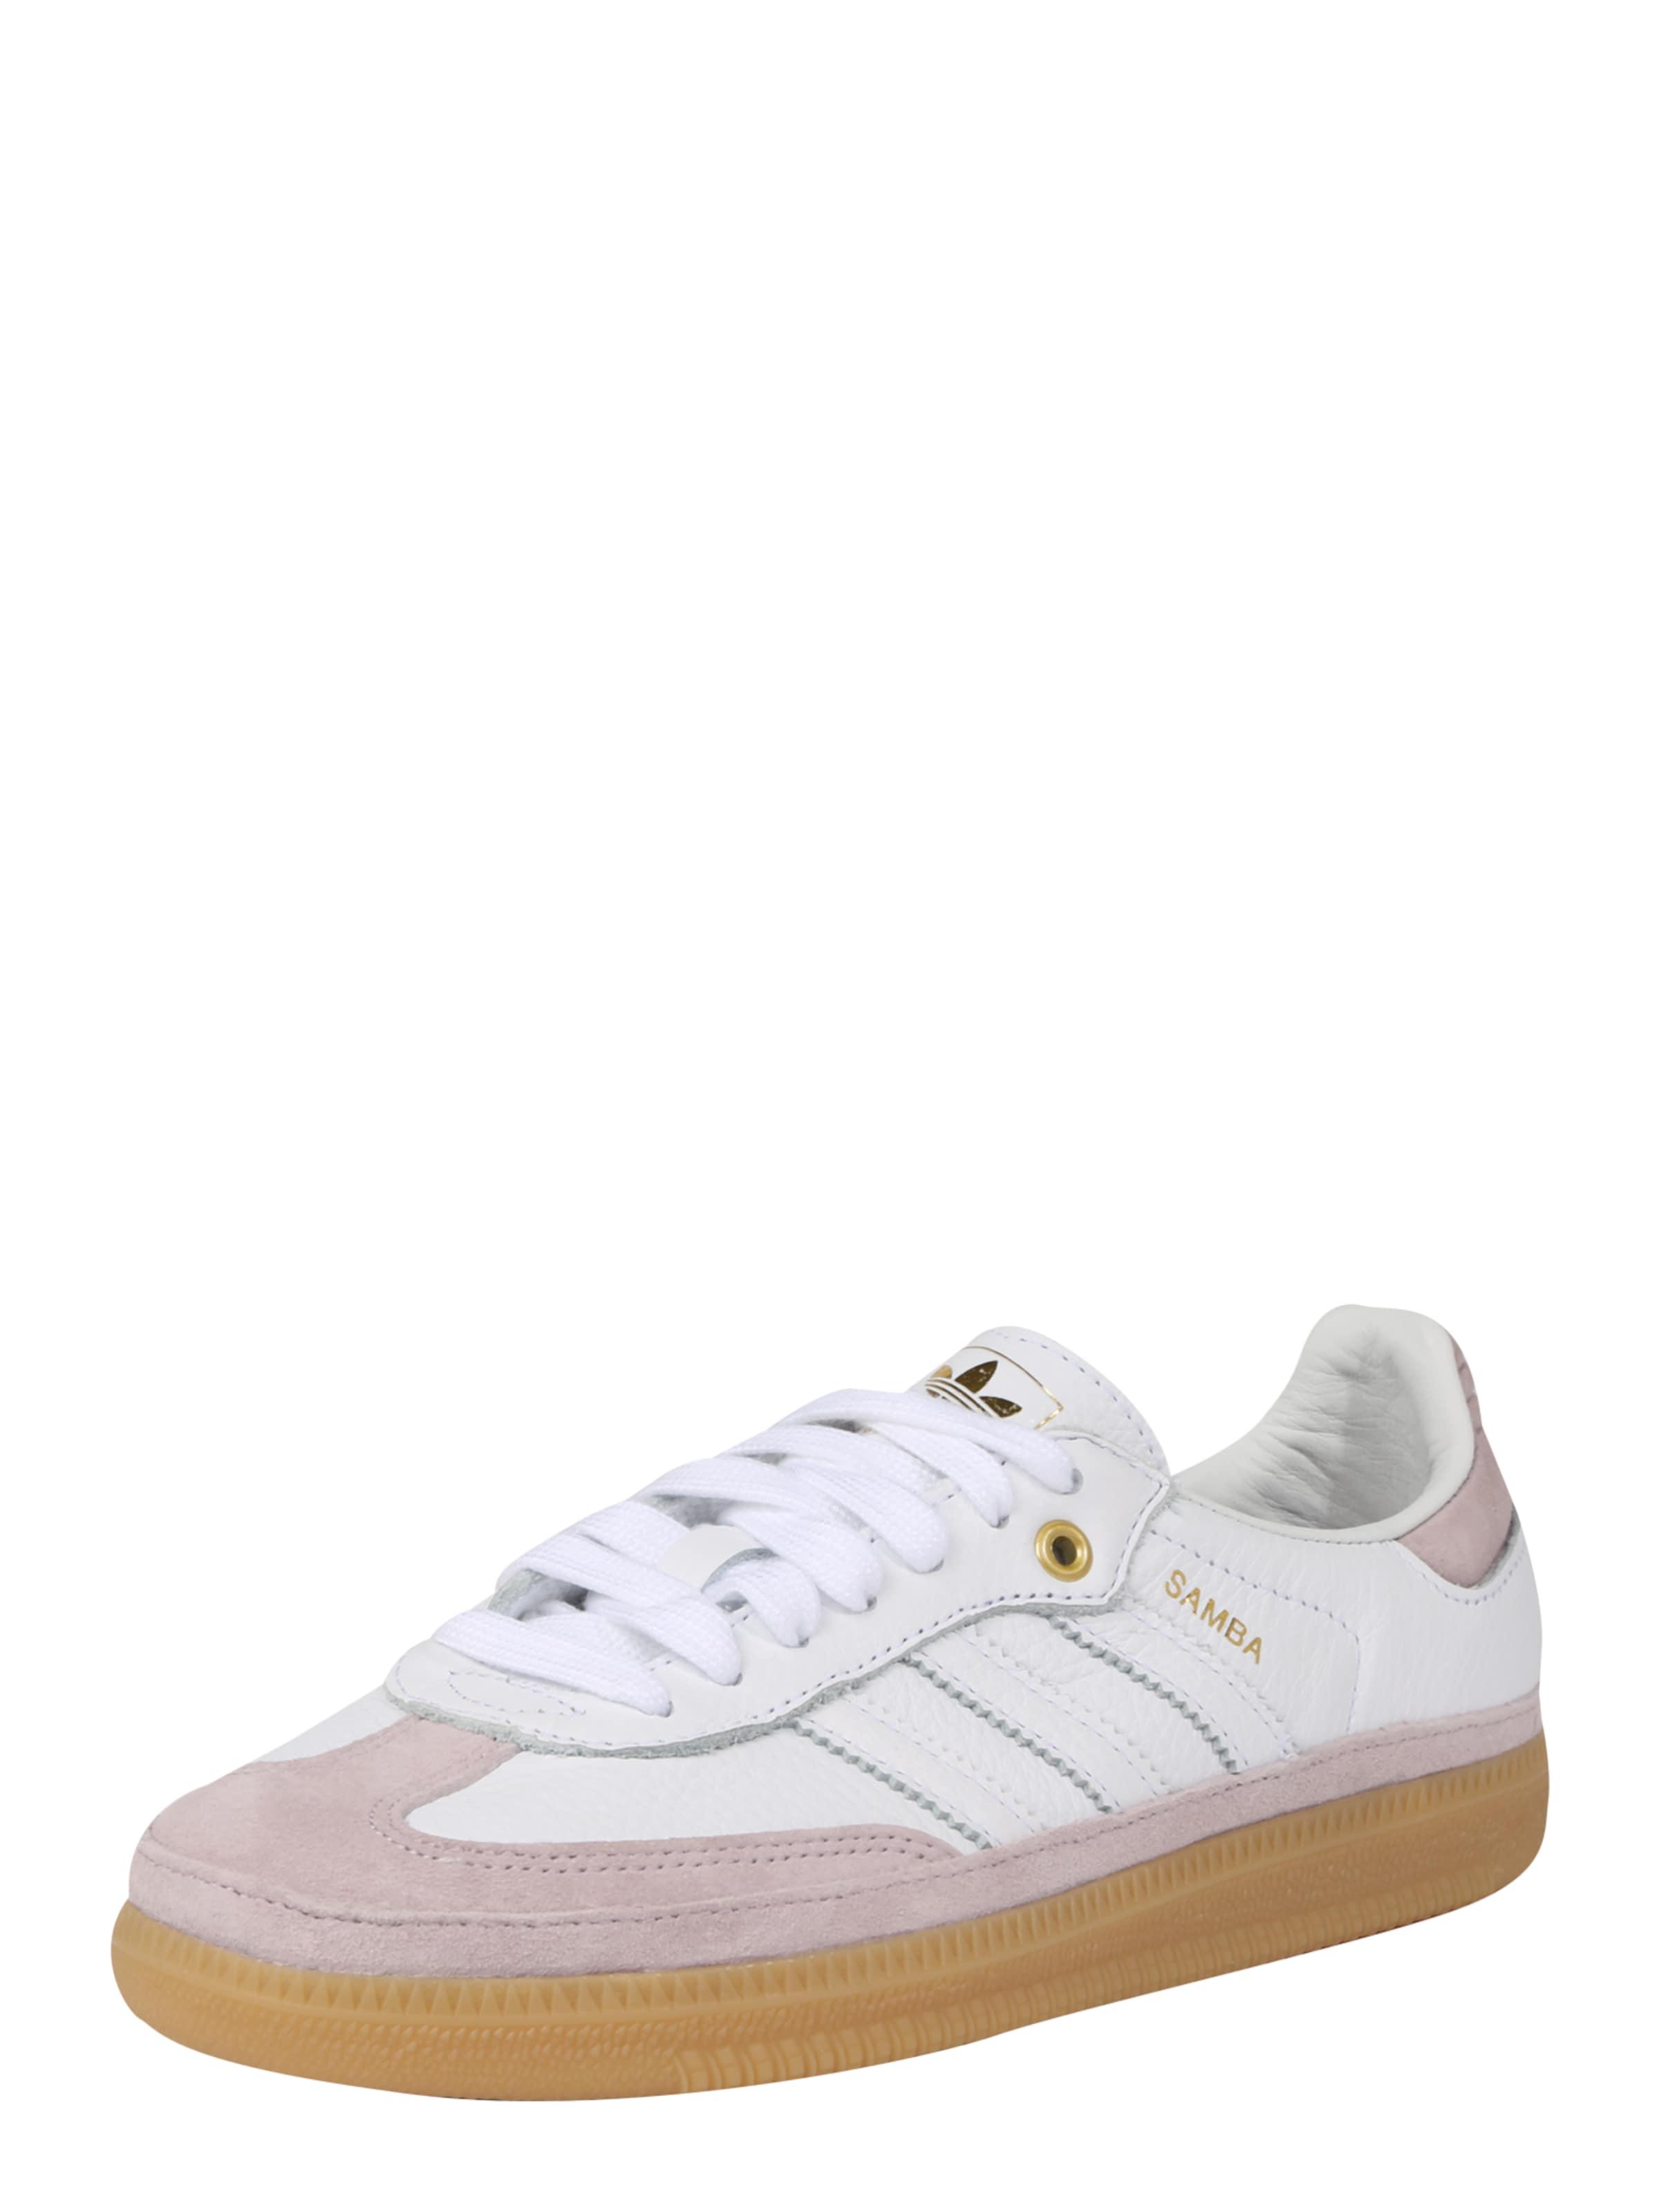 Adidas En Basses Originals Baskets 'samba' SableBlanc e9IWH2YbED